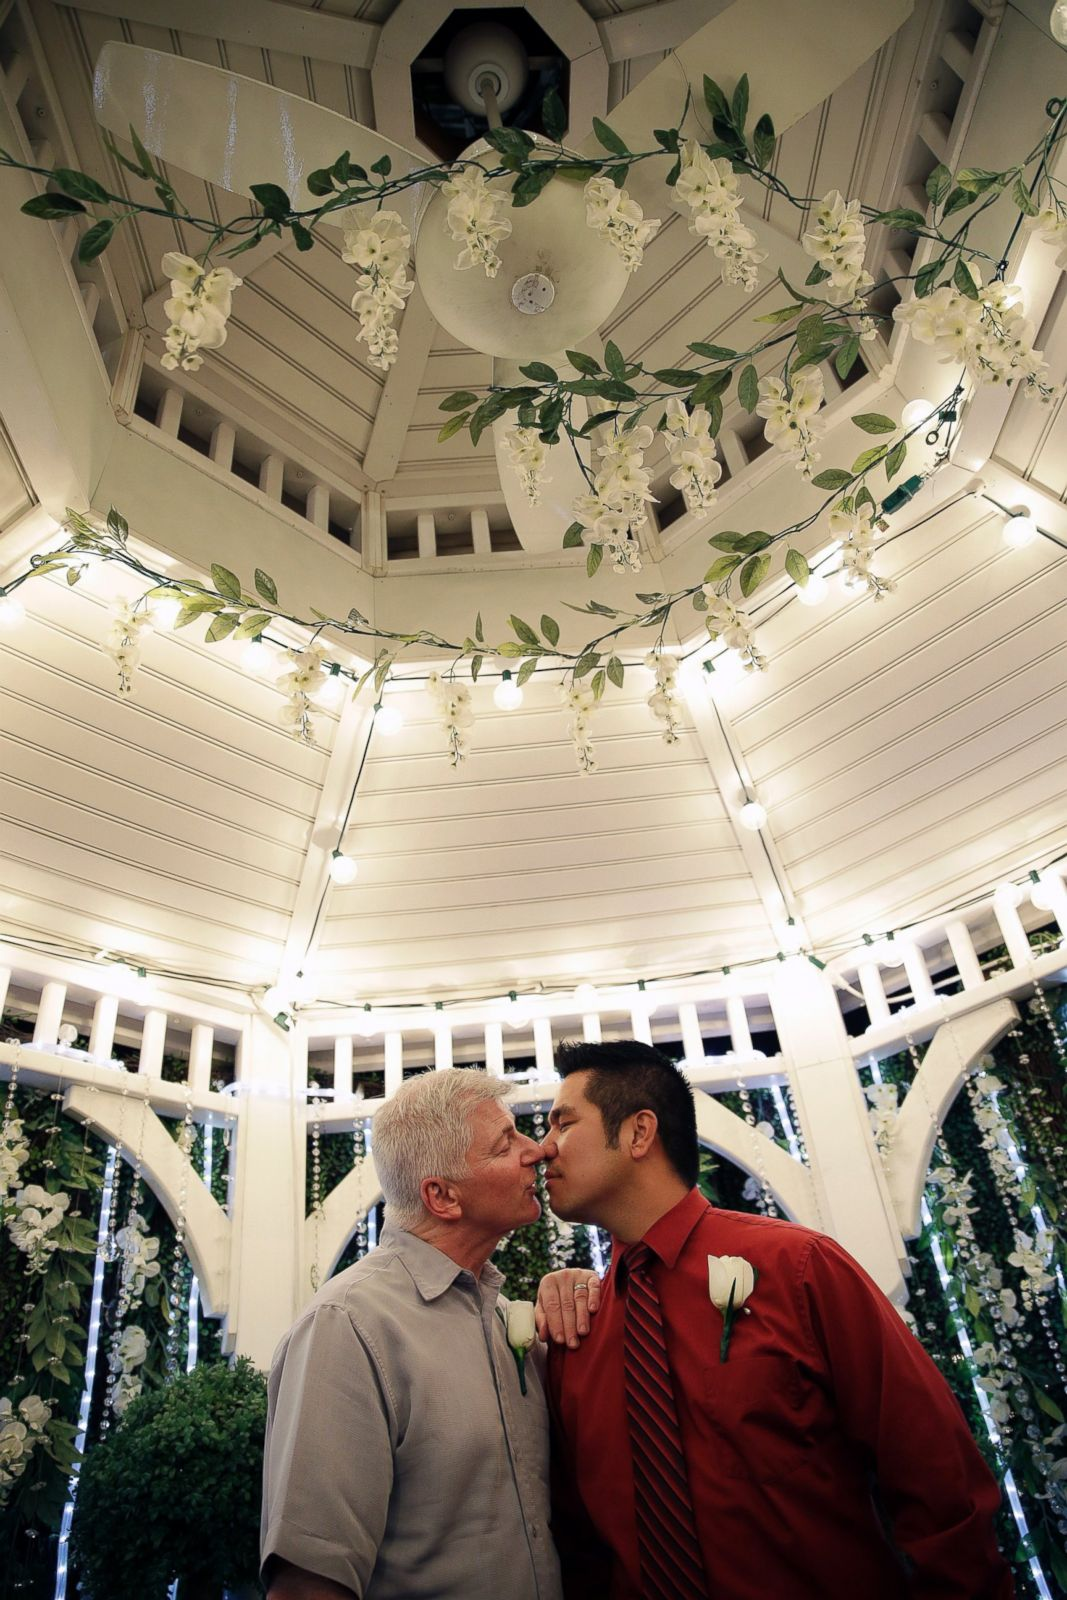 Ap gay marriage las vegas 7 sk 141010 2x3 1600jpg for Same sex wedding las vegas